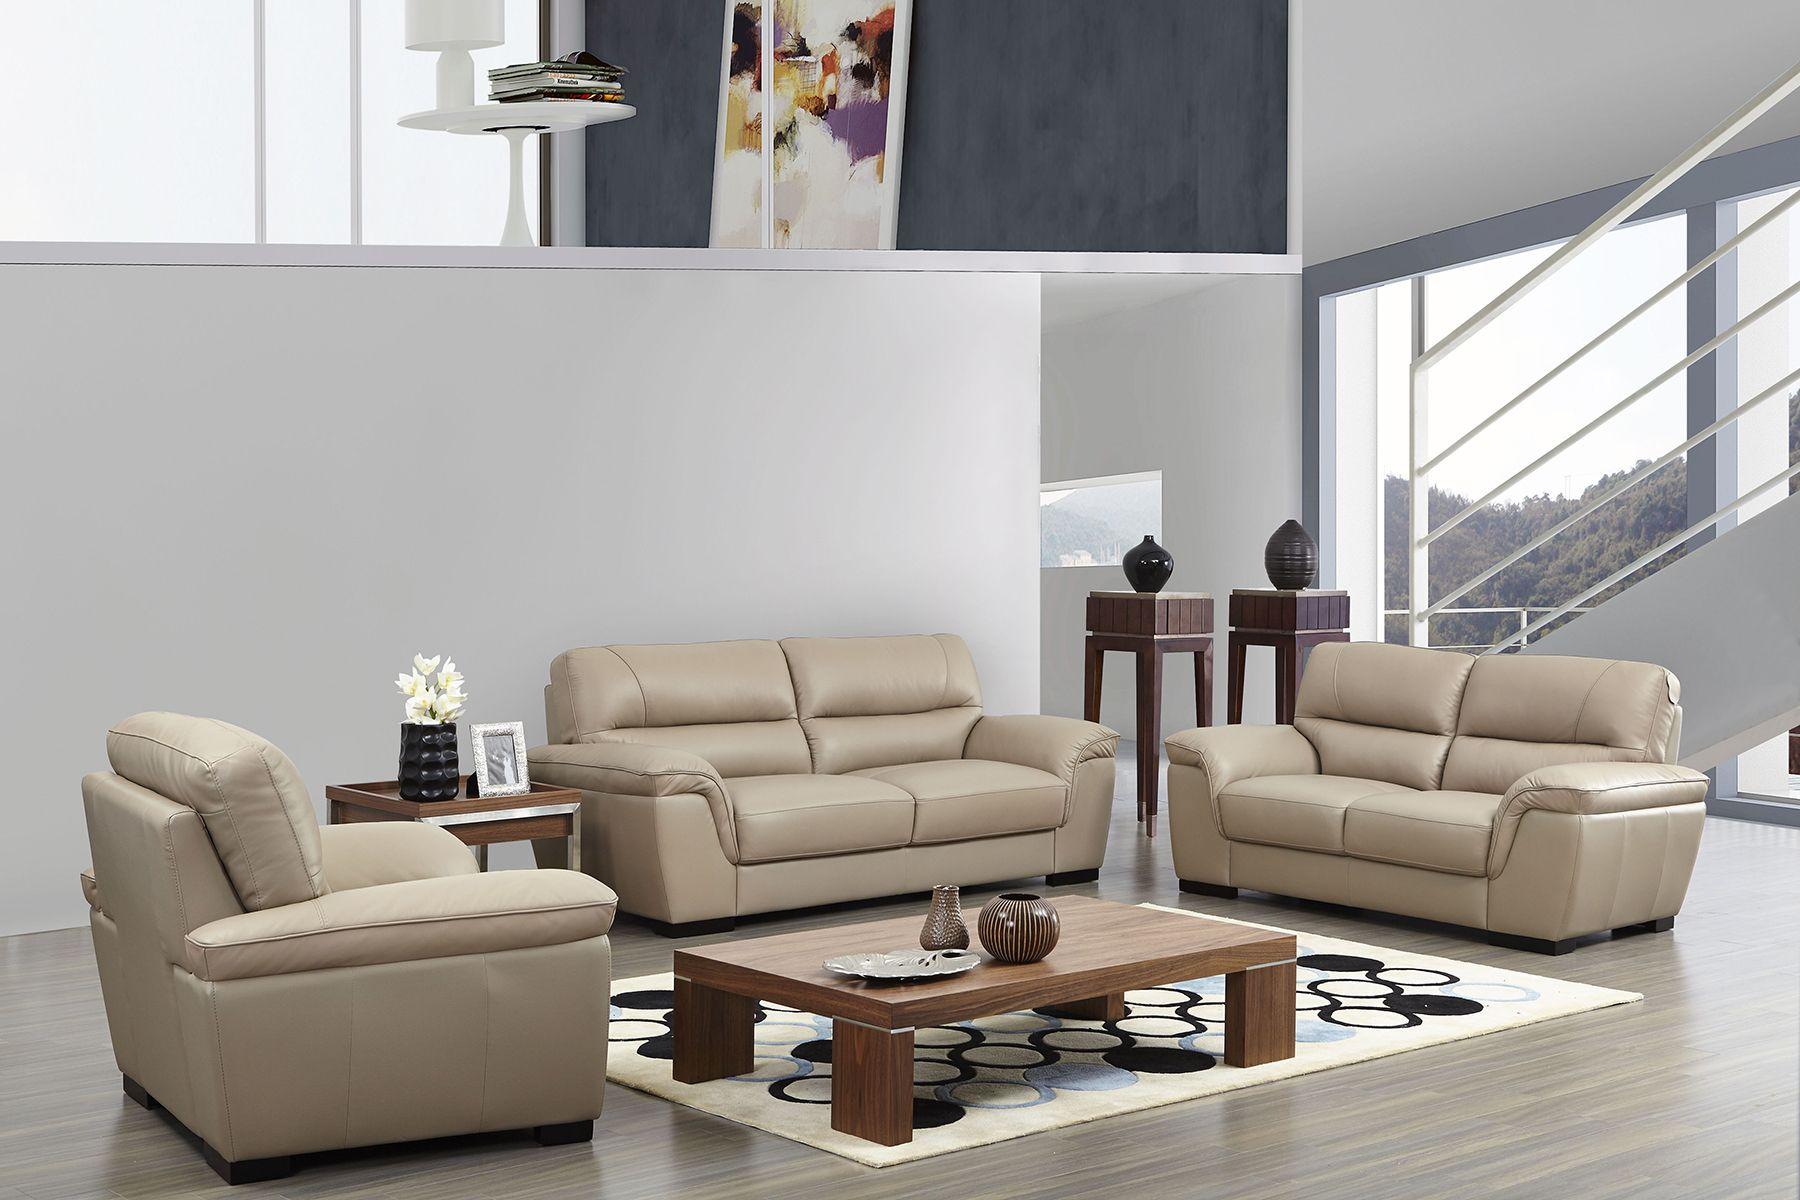 10 Diy Small Living Room Decor Ideas Sofa Loveseat Set Leather